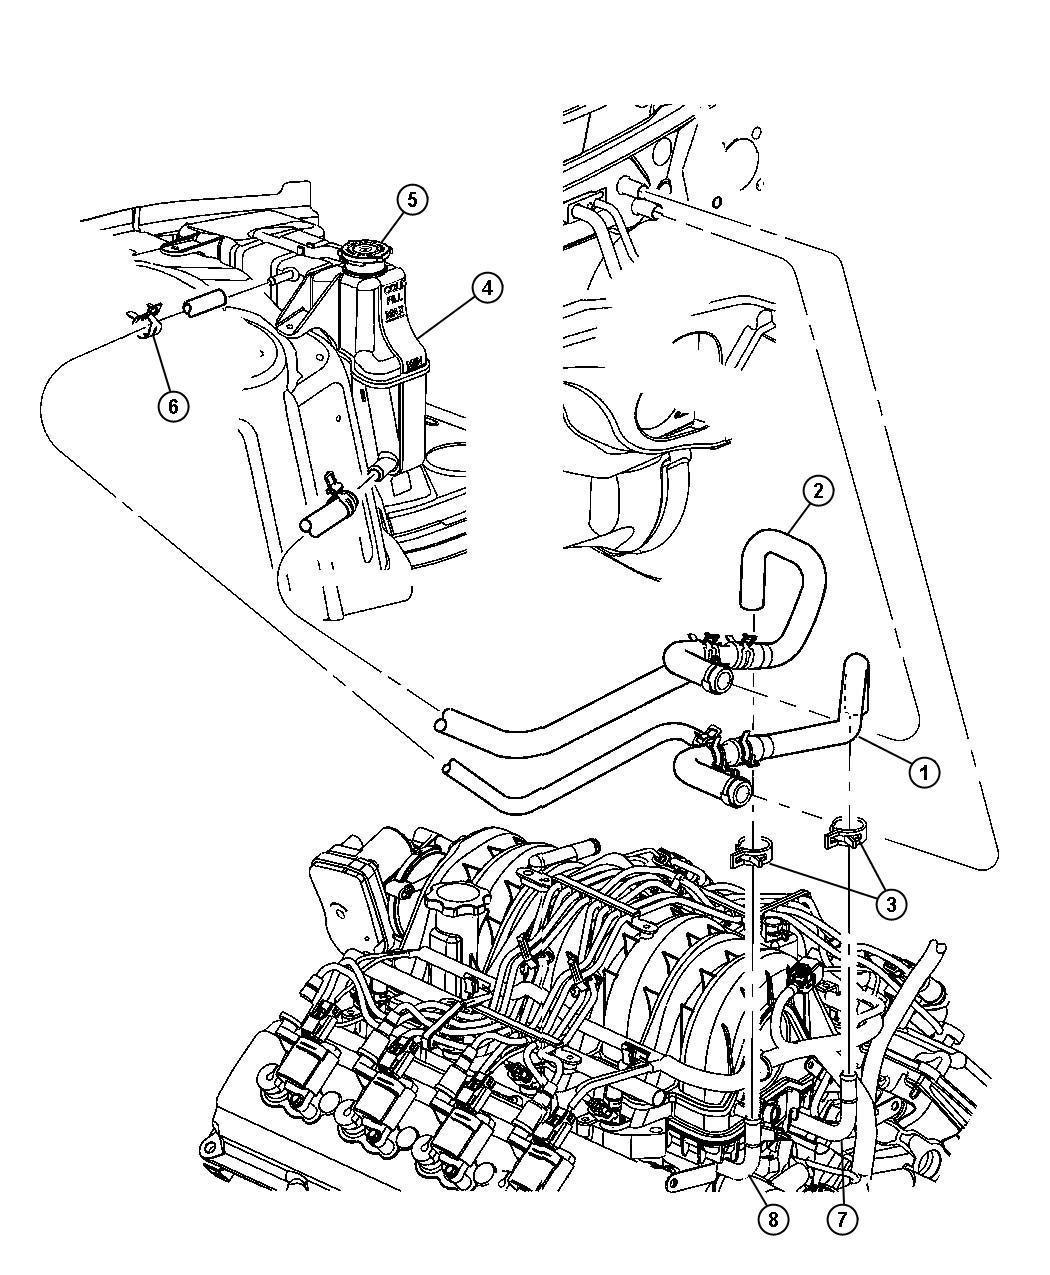 2005 Dodge Grand Caravan Engine Diagram Thermostat